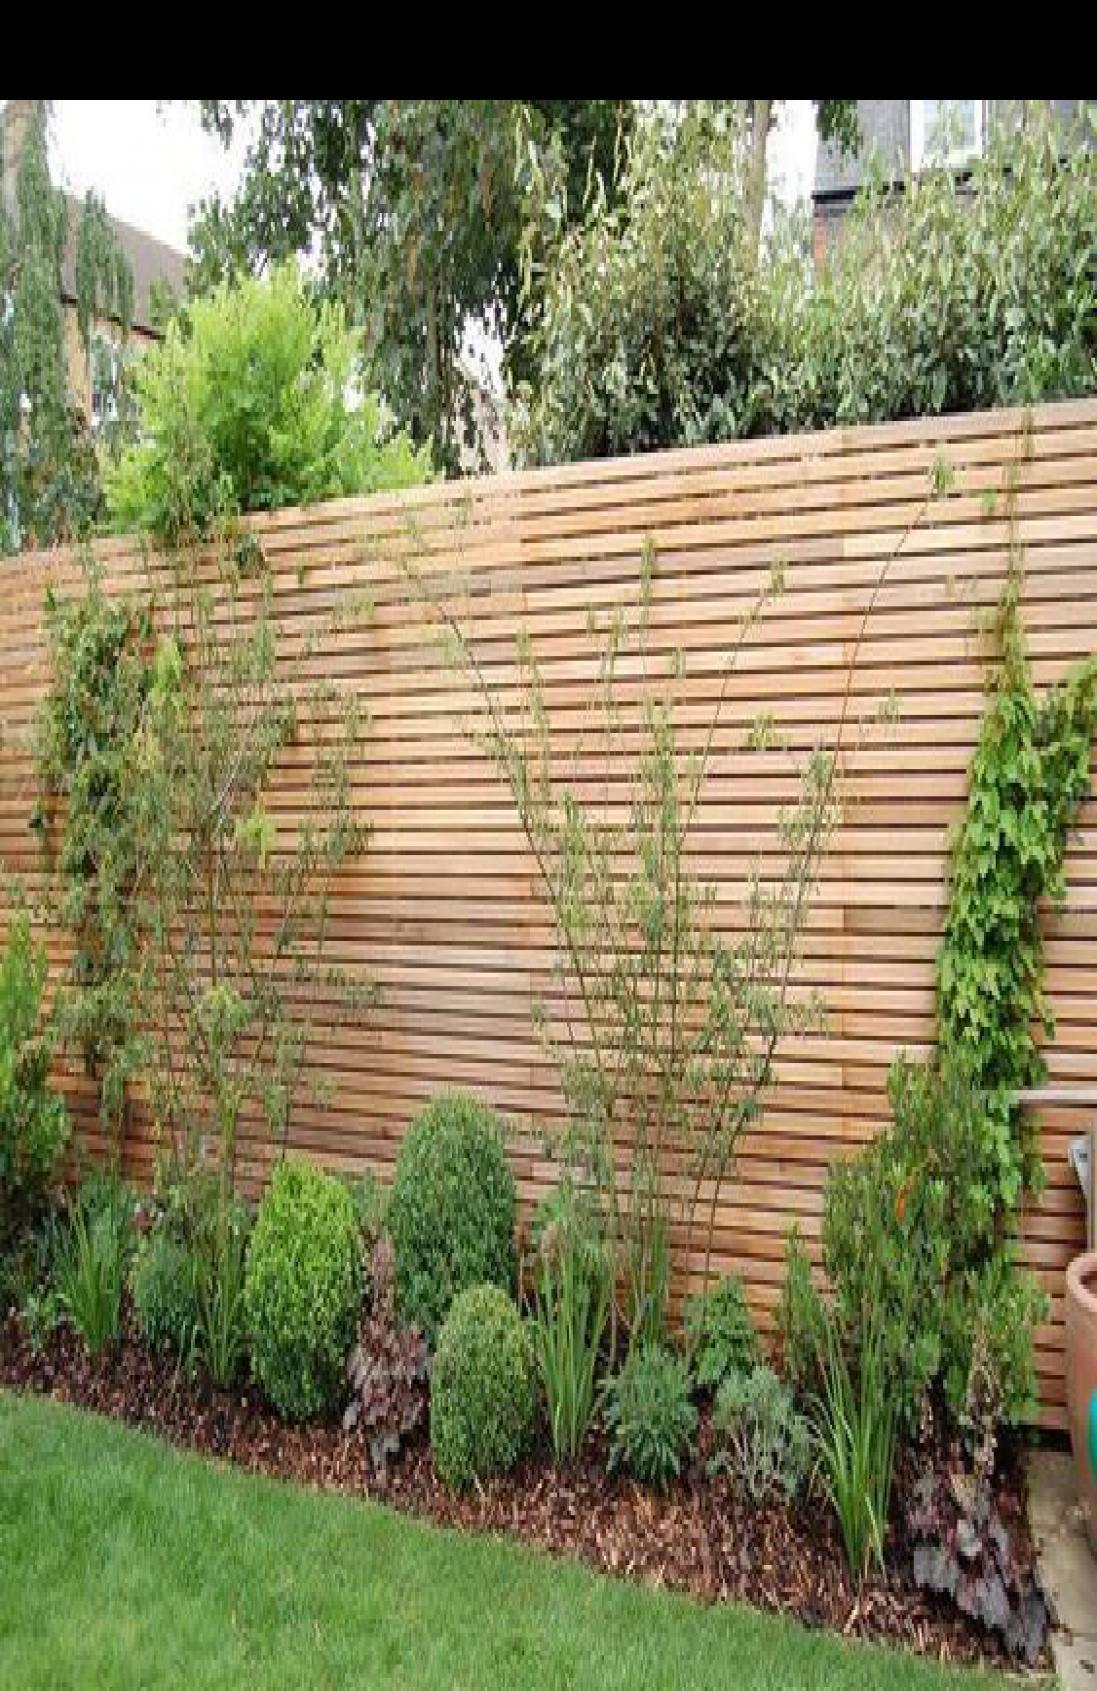 49 Fabulous Backyard Design Ideas On A Budget In 2020 Garden Design